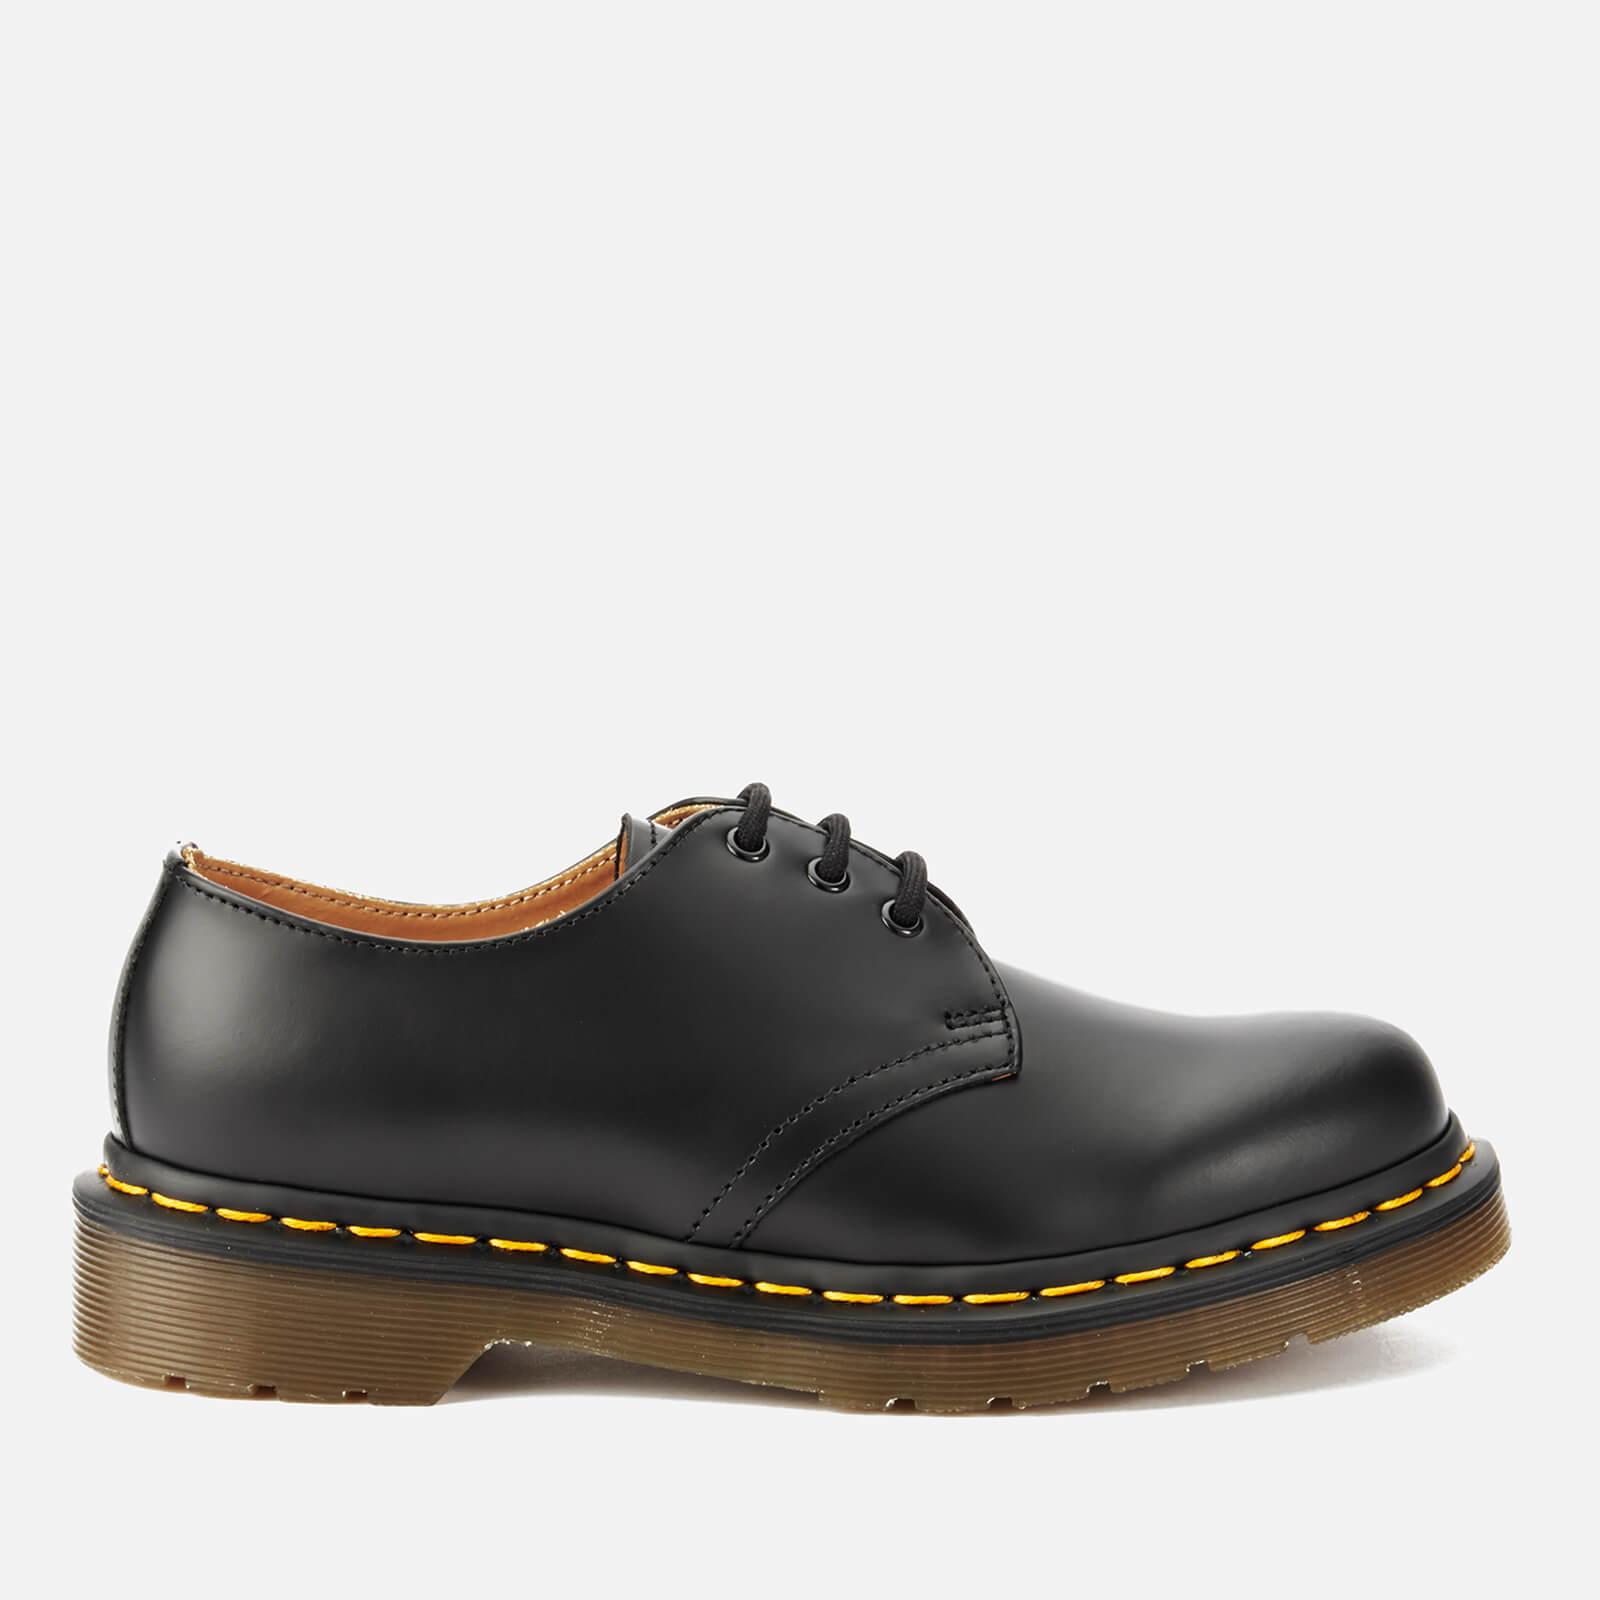 Dr. Martens 1461 Smooth Leather 3-Eye Shoes - Black - UK 4